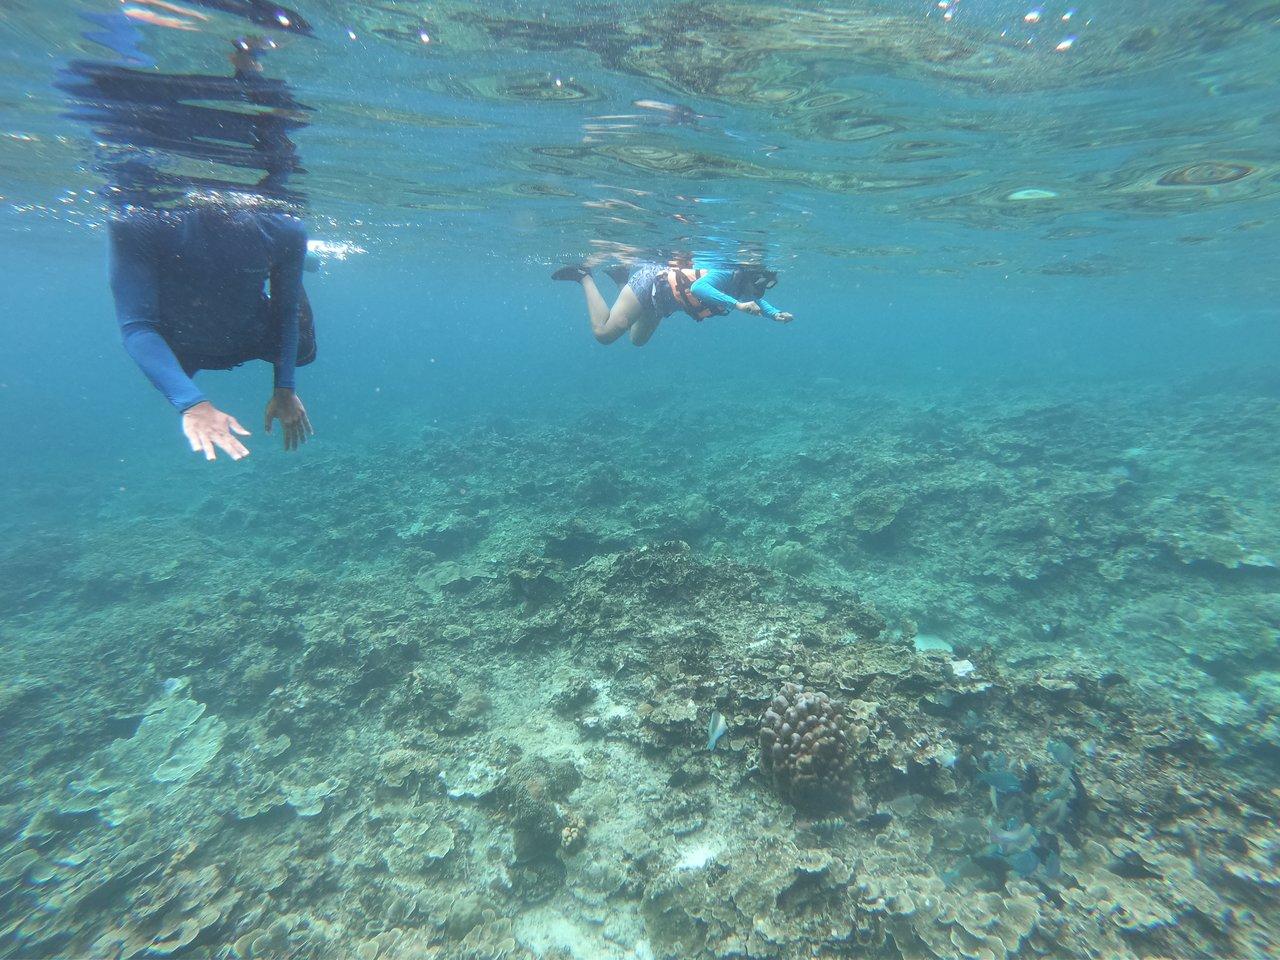 Among the Corals | Photo taken by Debajyoti R